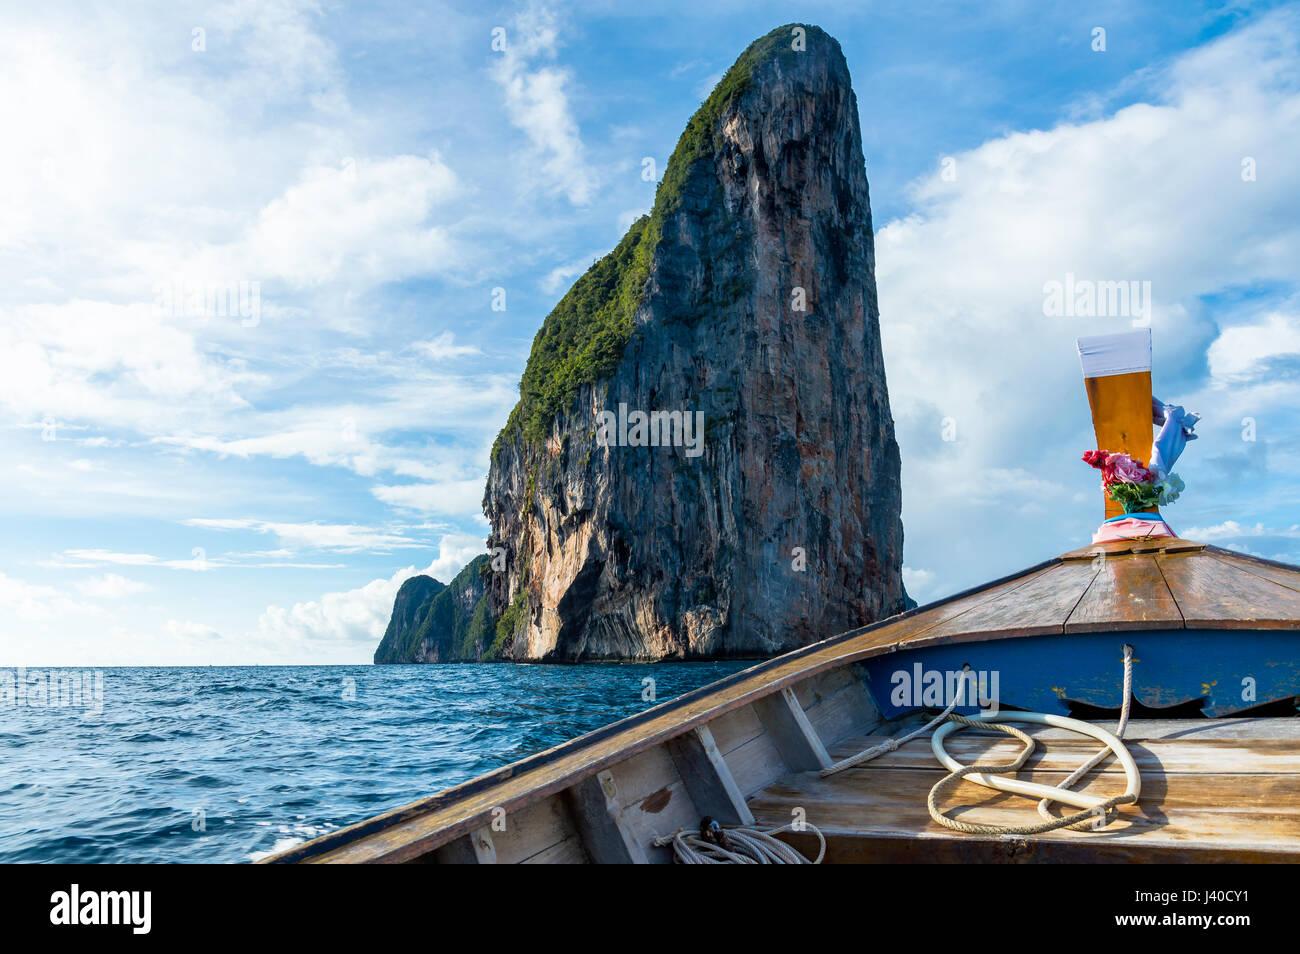 Longtail-Boot im Meer gegen blauen Himmel und Insel Stockbild